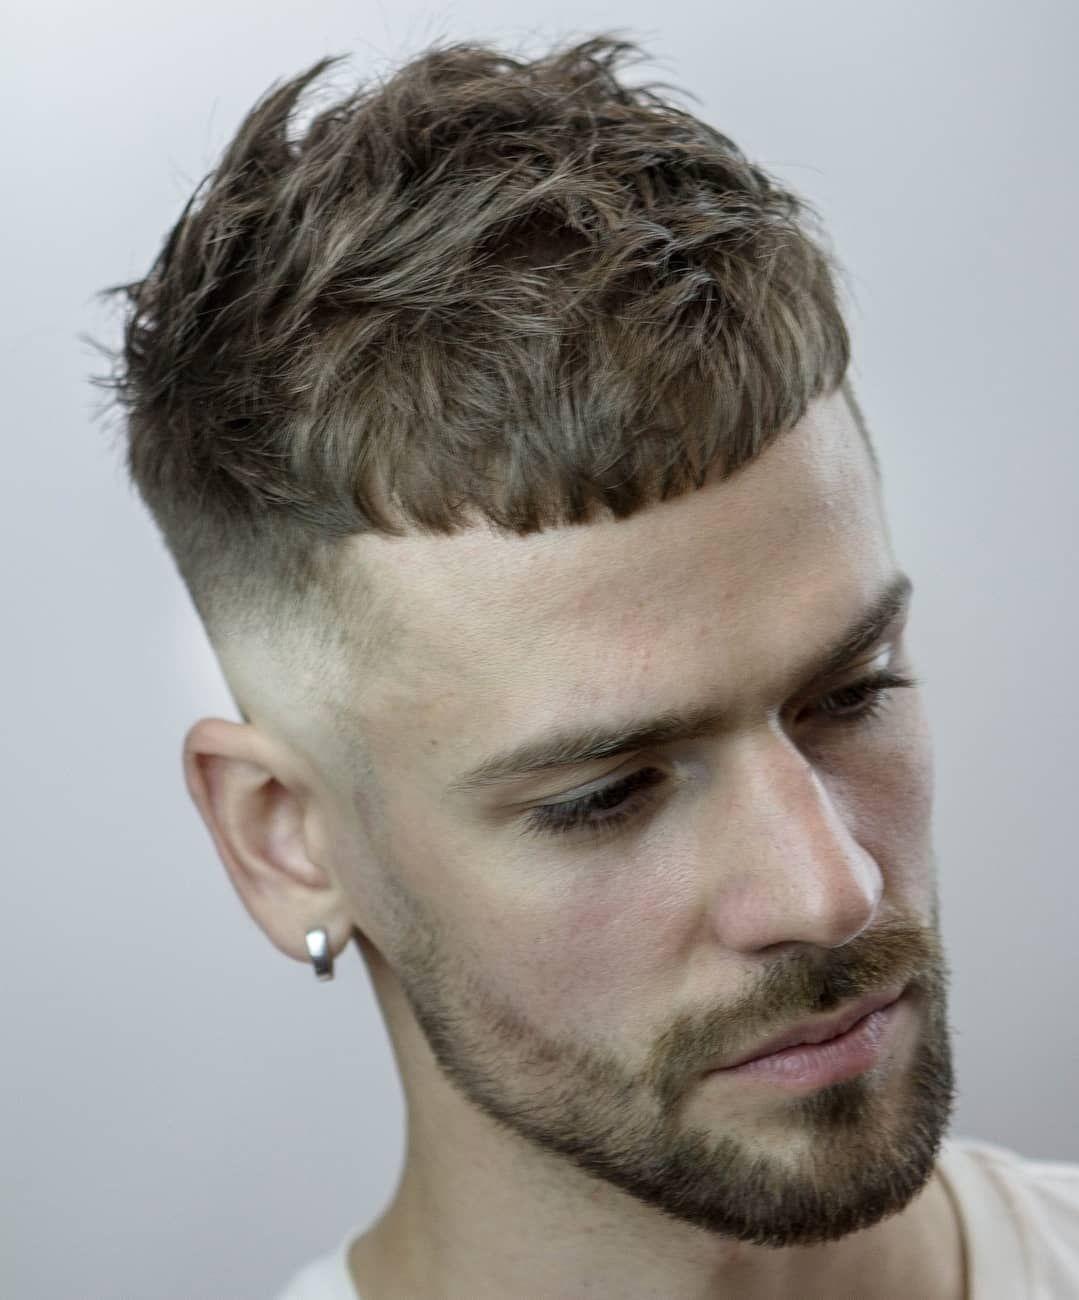 french crop fade 2019 | hair design in 2019 | hair cuts